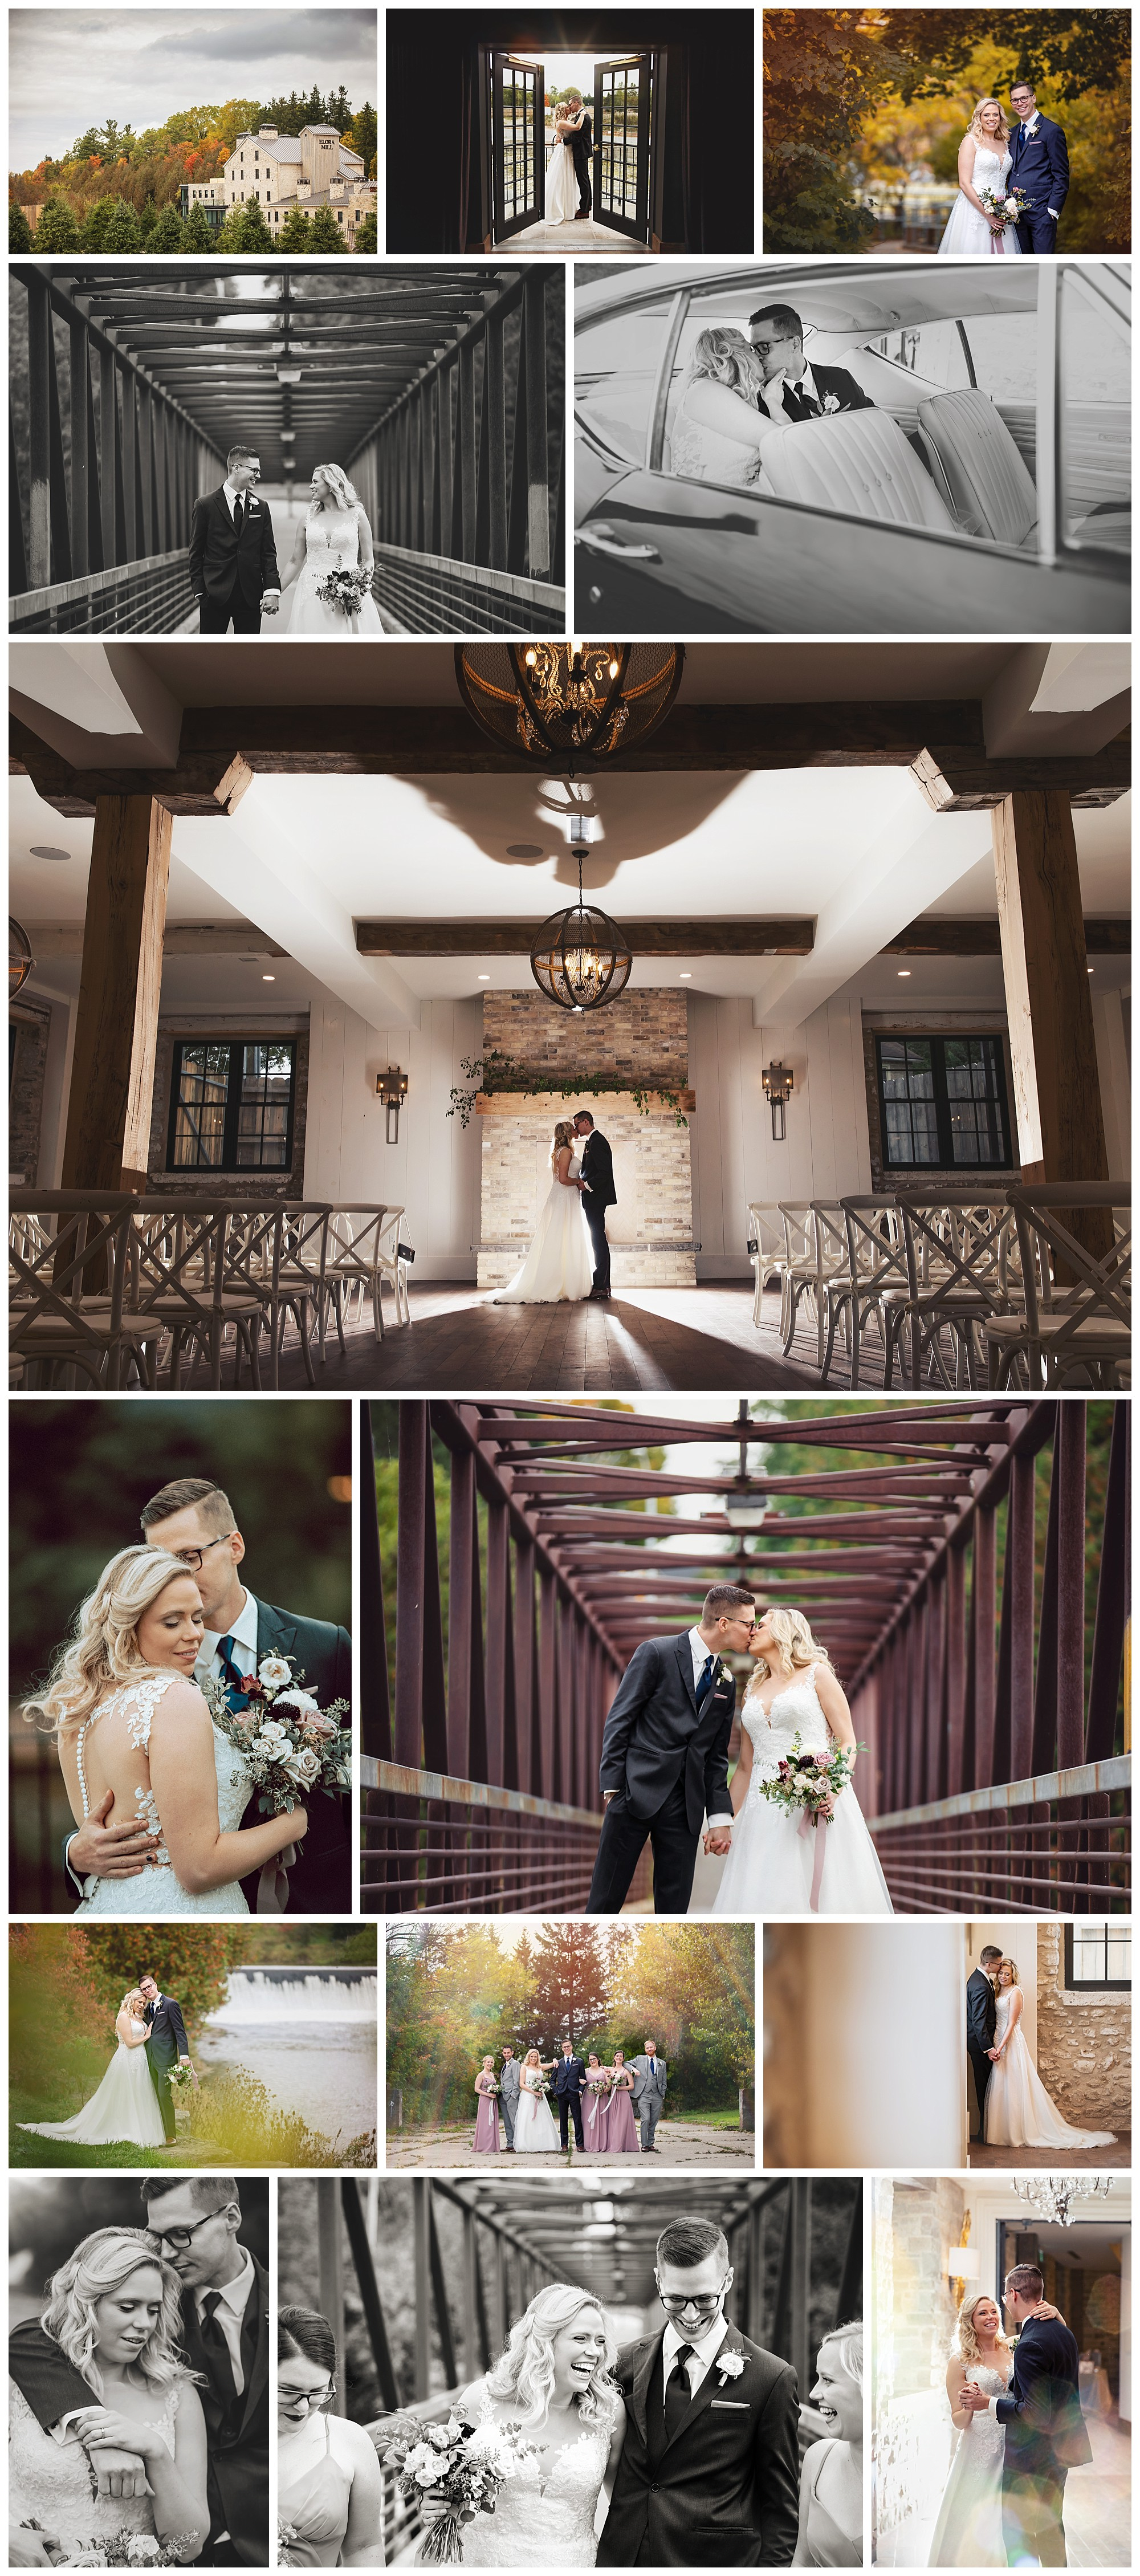 Elora Mill & Spa, Elora, Ontario wedding photography by VanDaele & Russell